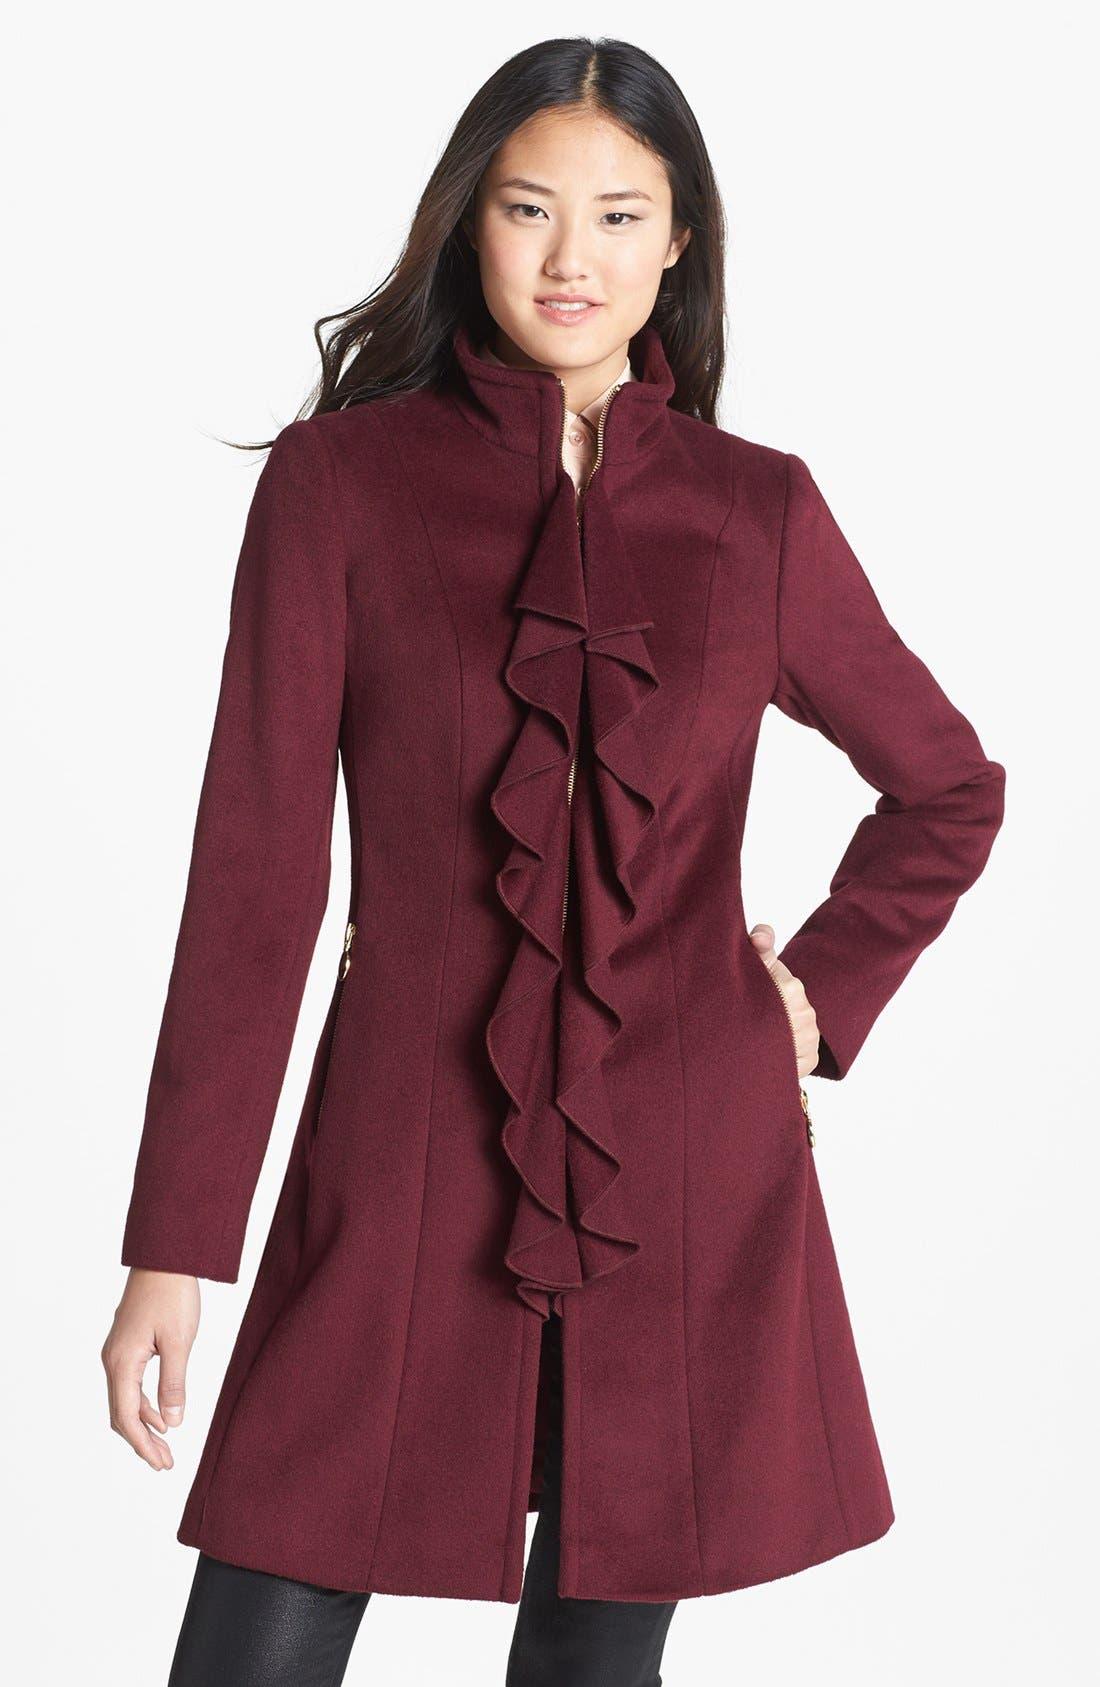 Alternate Image 1 Selected - T Tahari 'Kendra' Ruffle Front Walking Coat